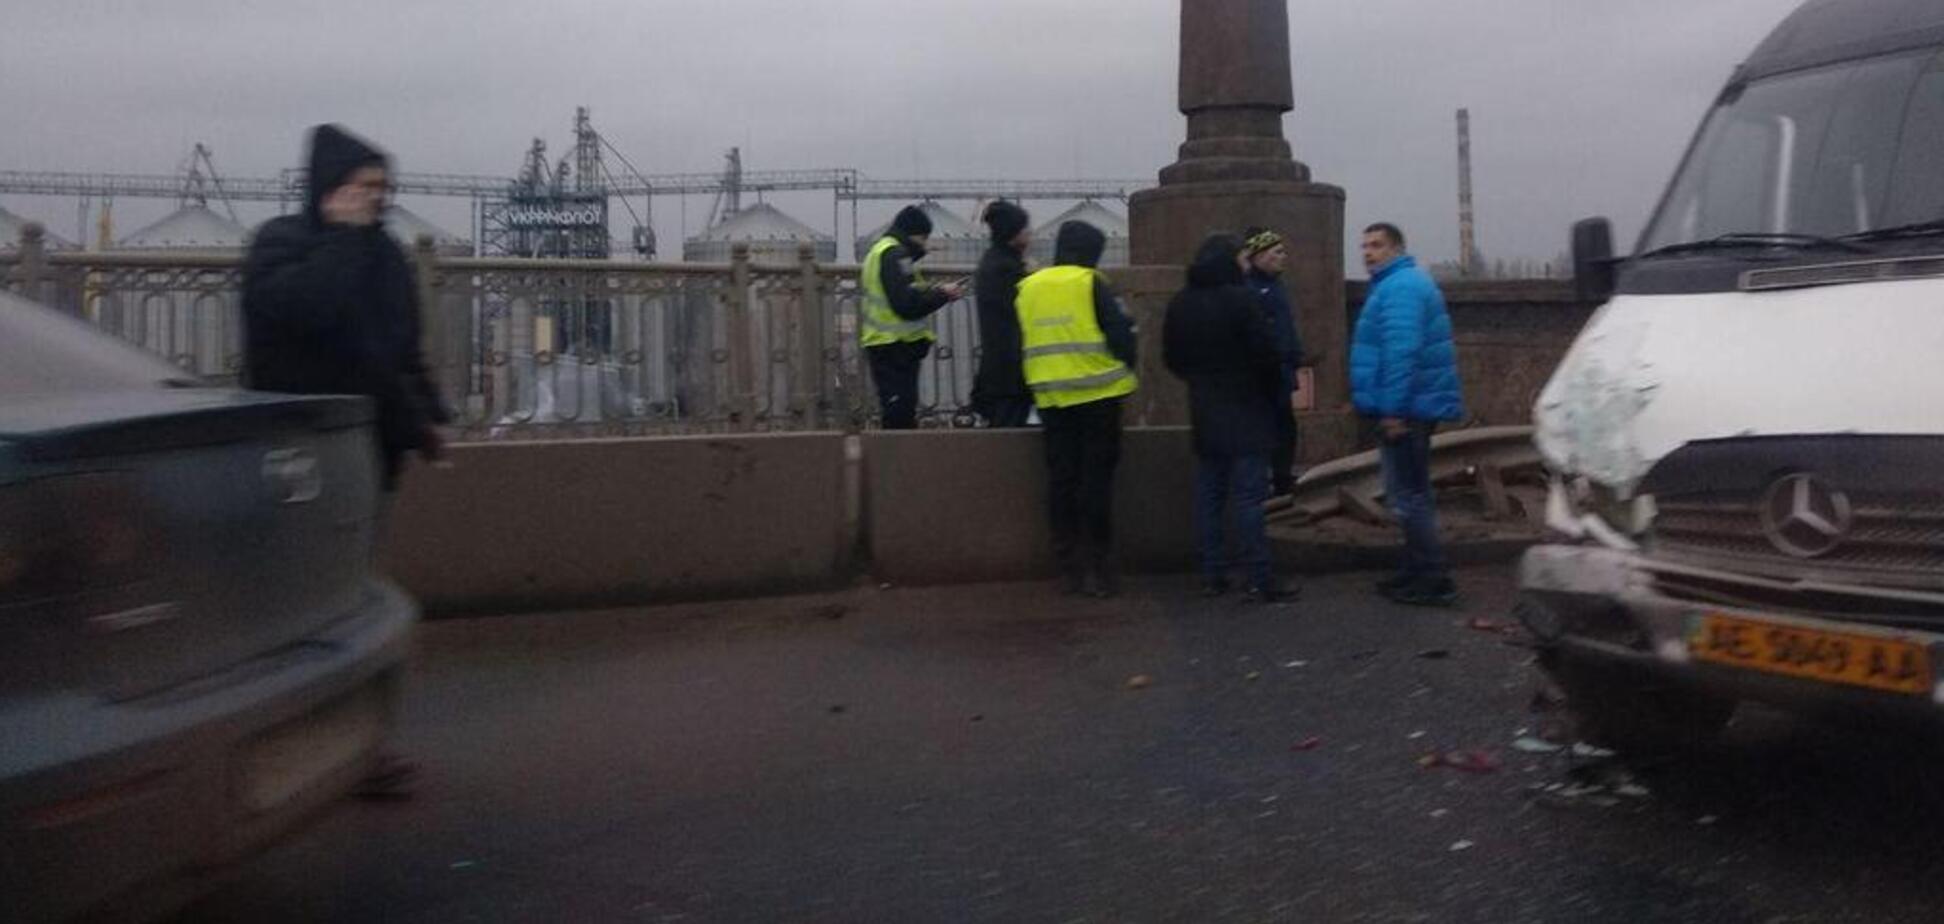 В Днепре на Старом мосту столкнулись Renault и Mercedes Sprinter: двое пострадавших. Видео